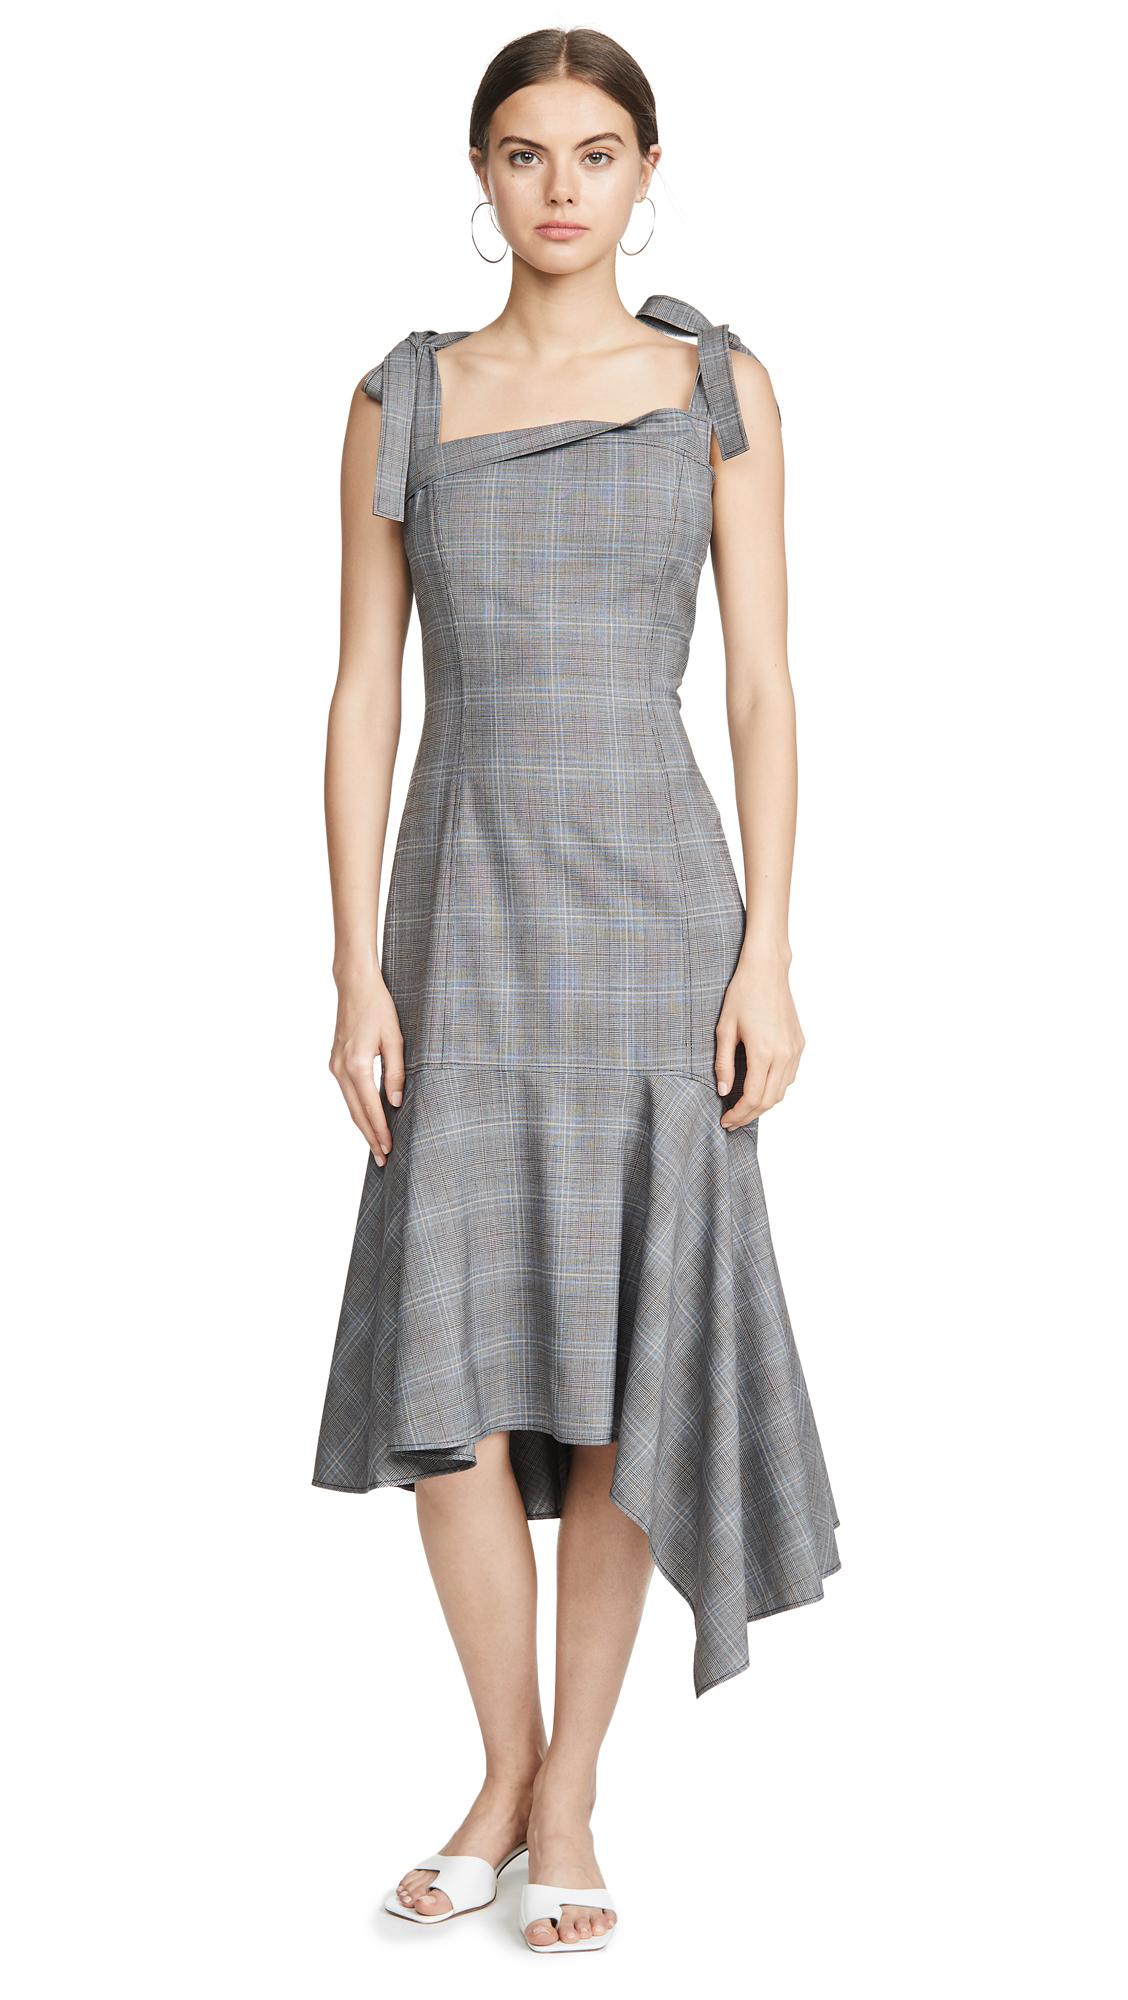 Adeam Bustier Handkerchief Dress - Slate